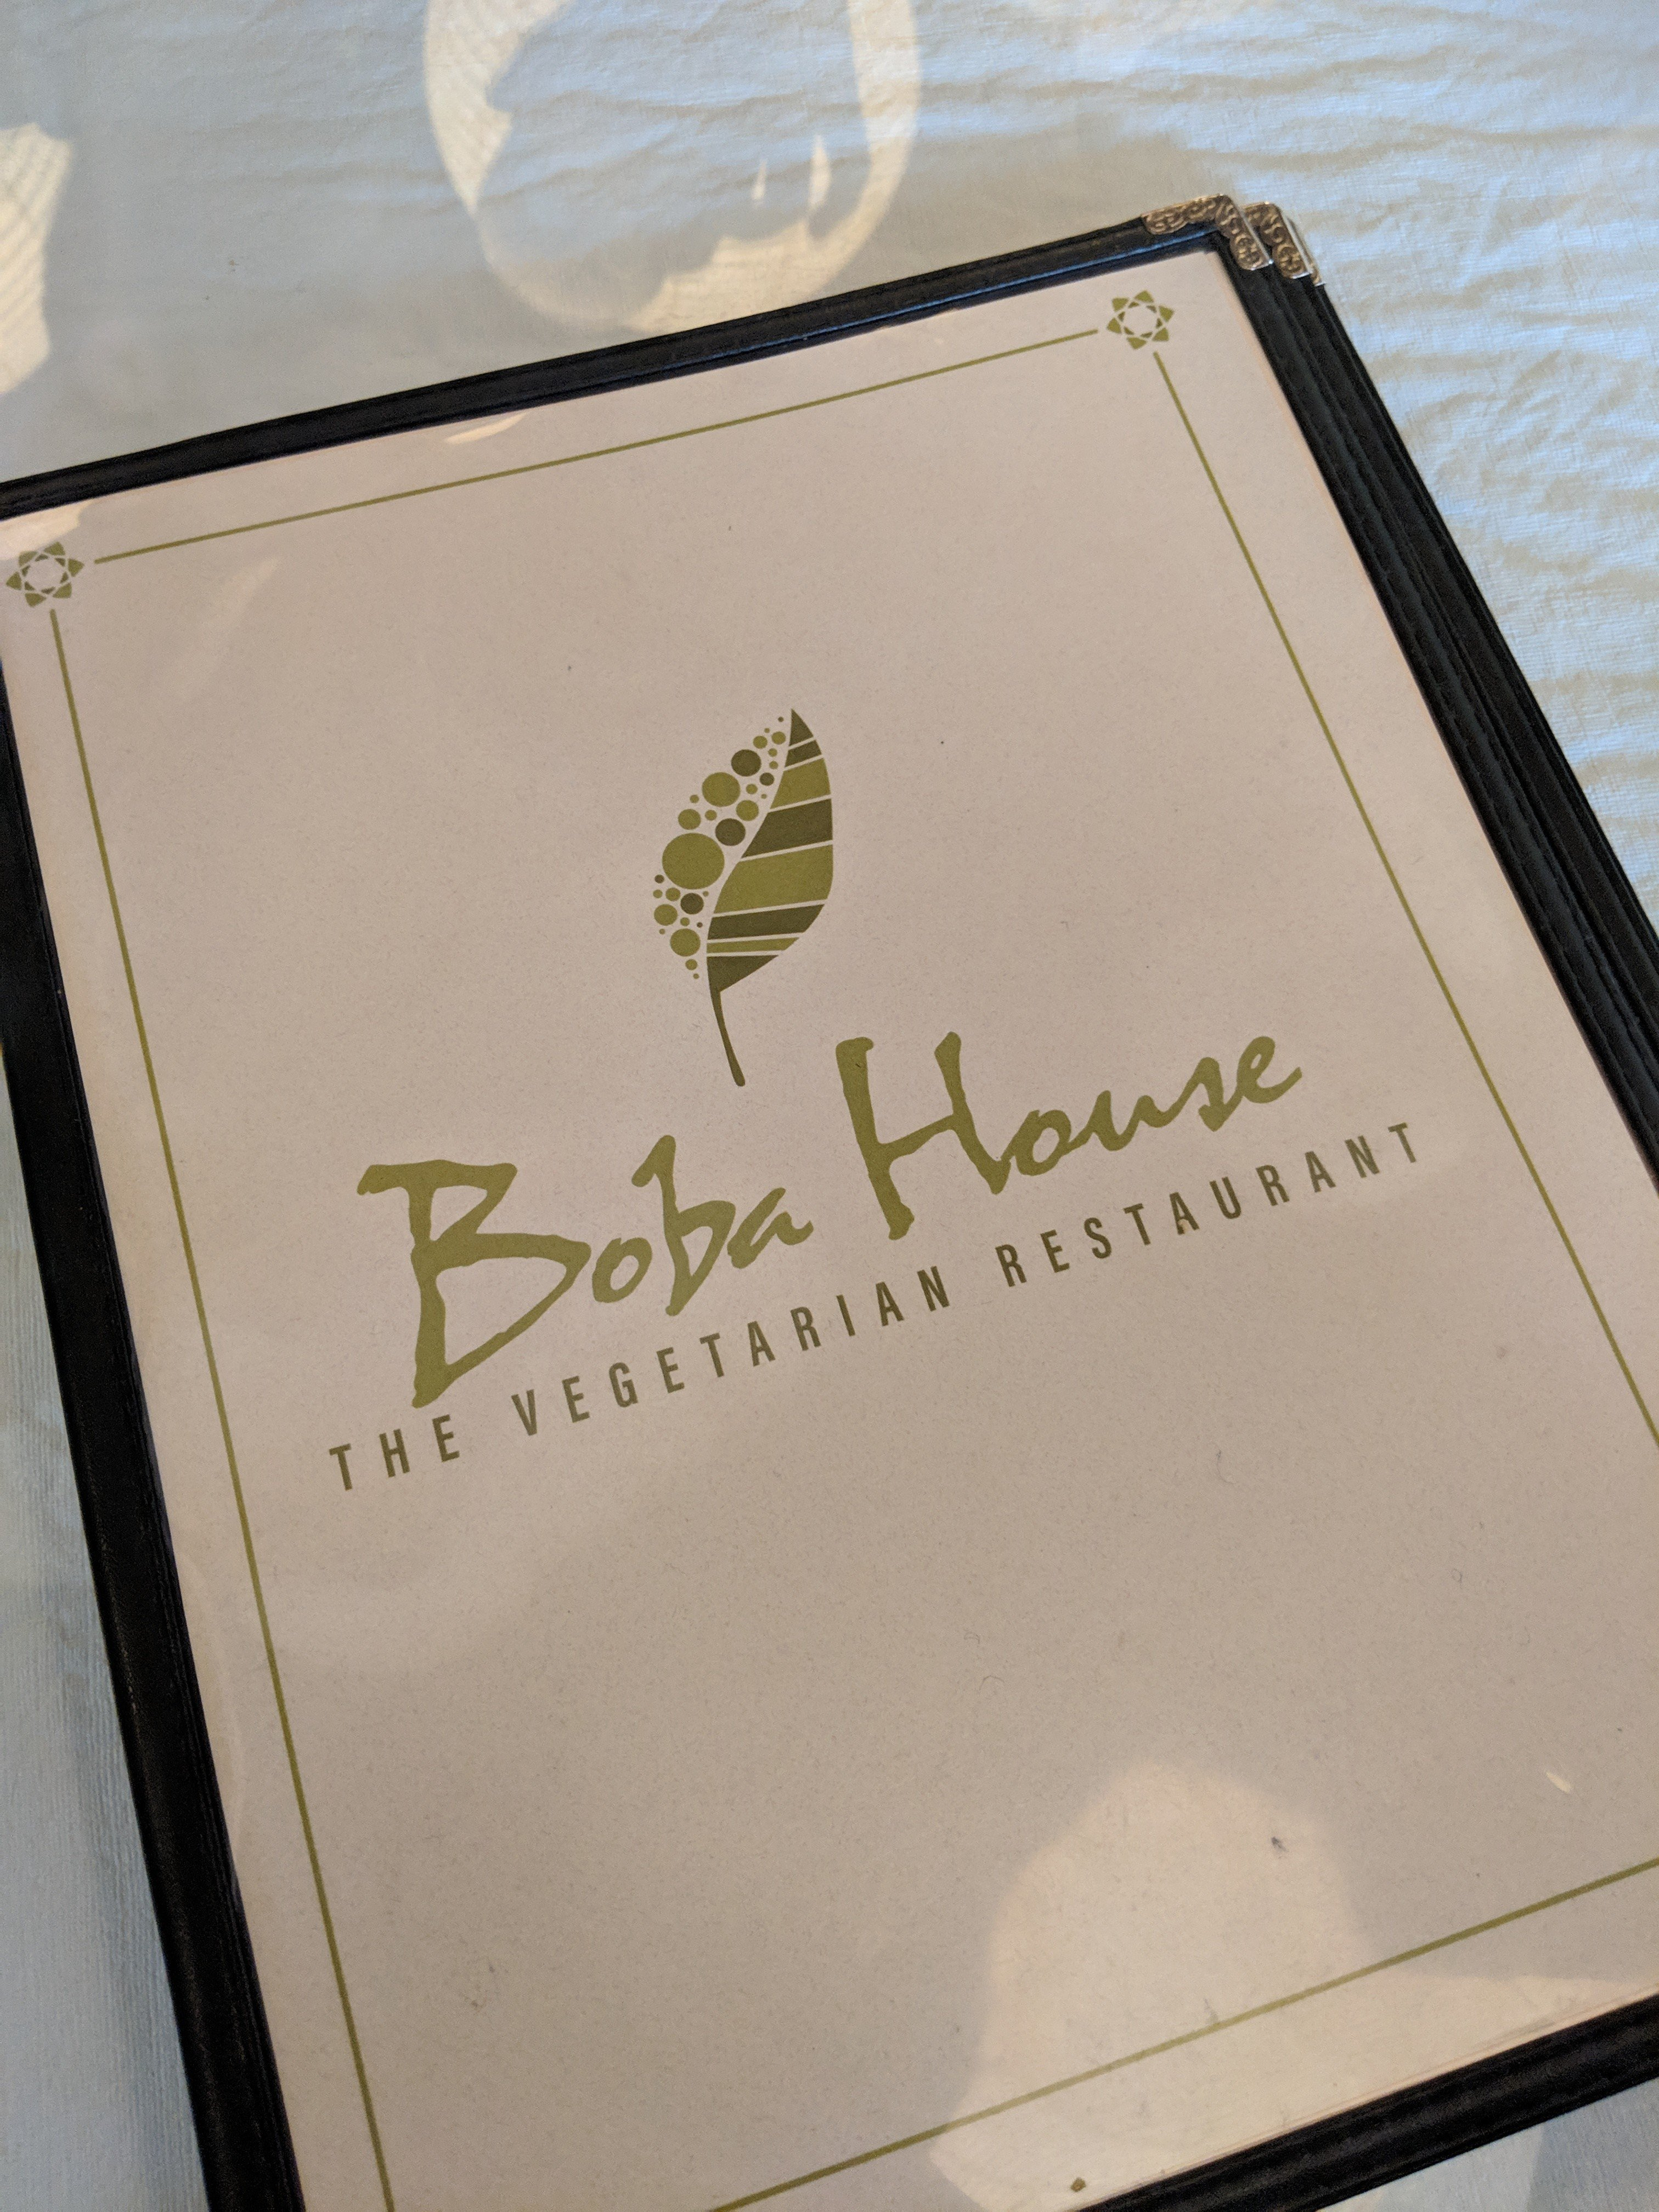 Boba House Vegetarian Restaurant in Greensoboro, NC